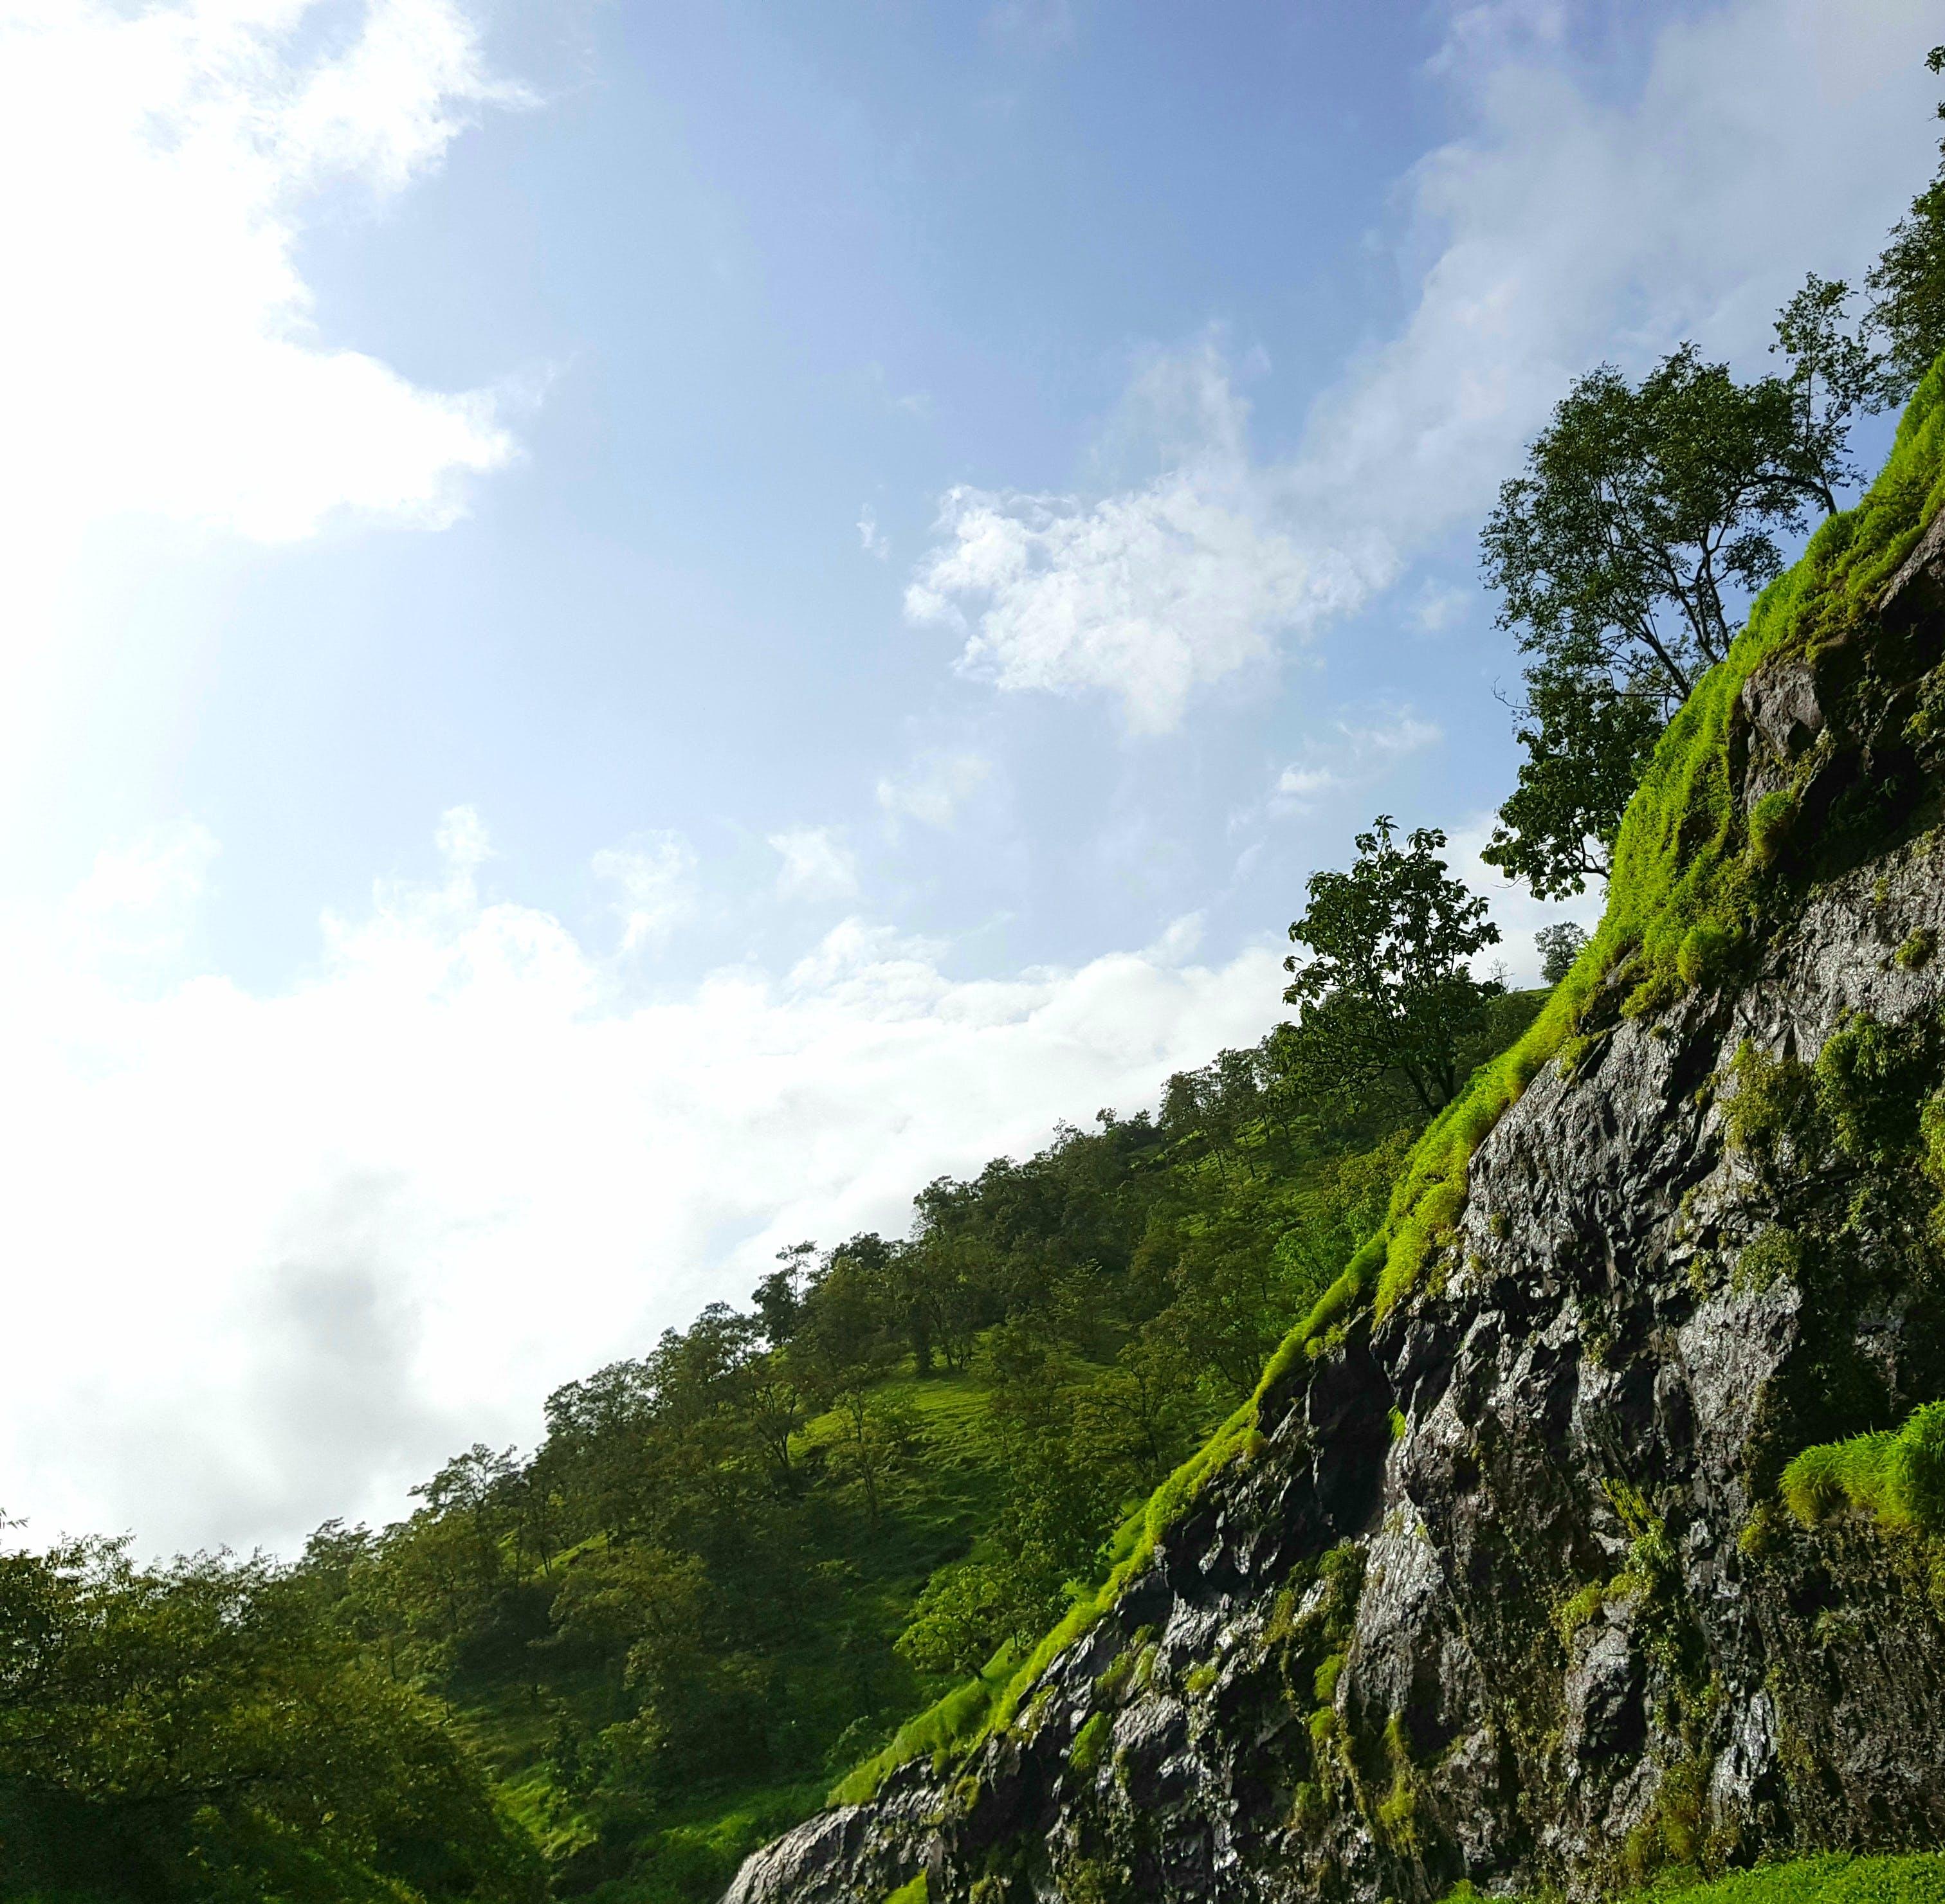 Kostenloses Stock Foto zu blauer himmel, naturfotografie